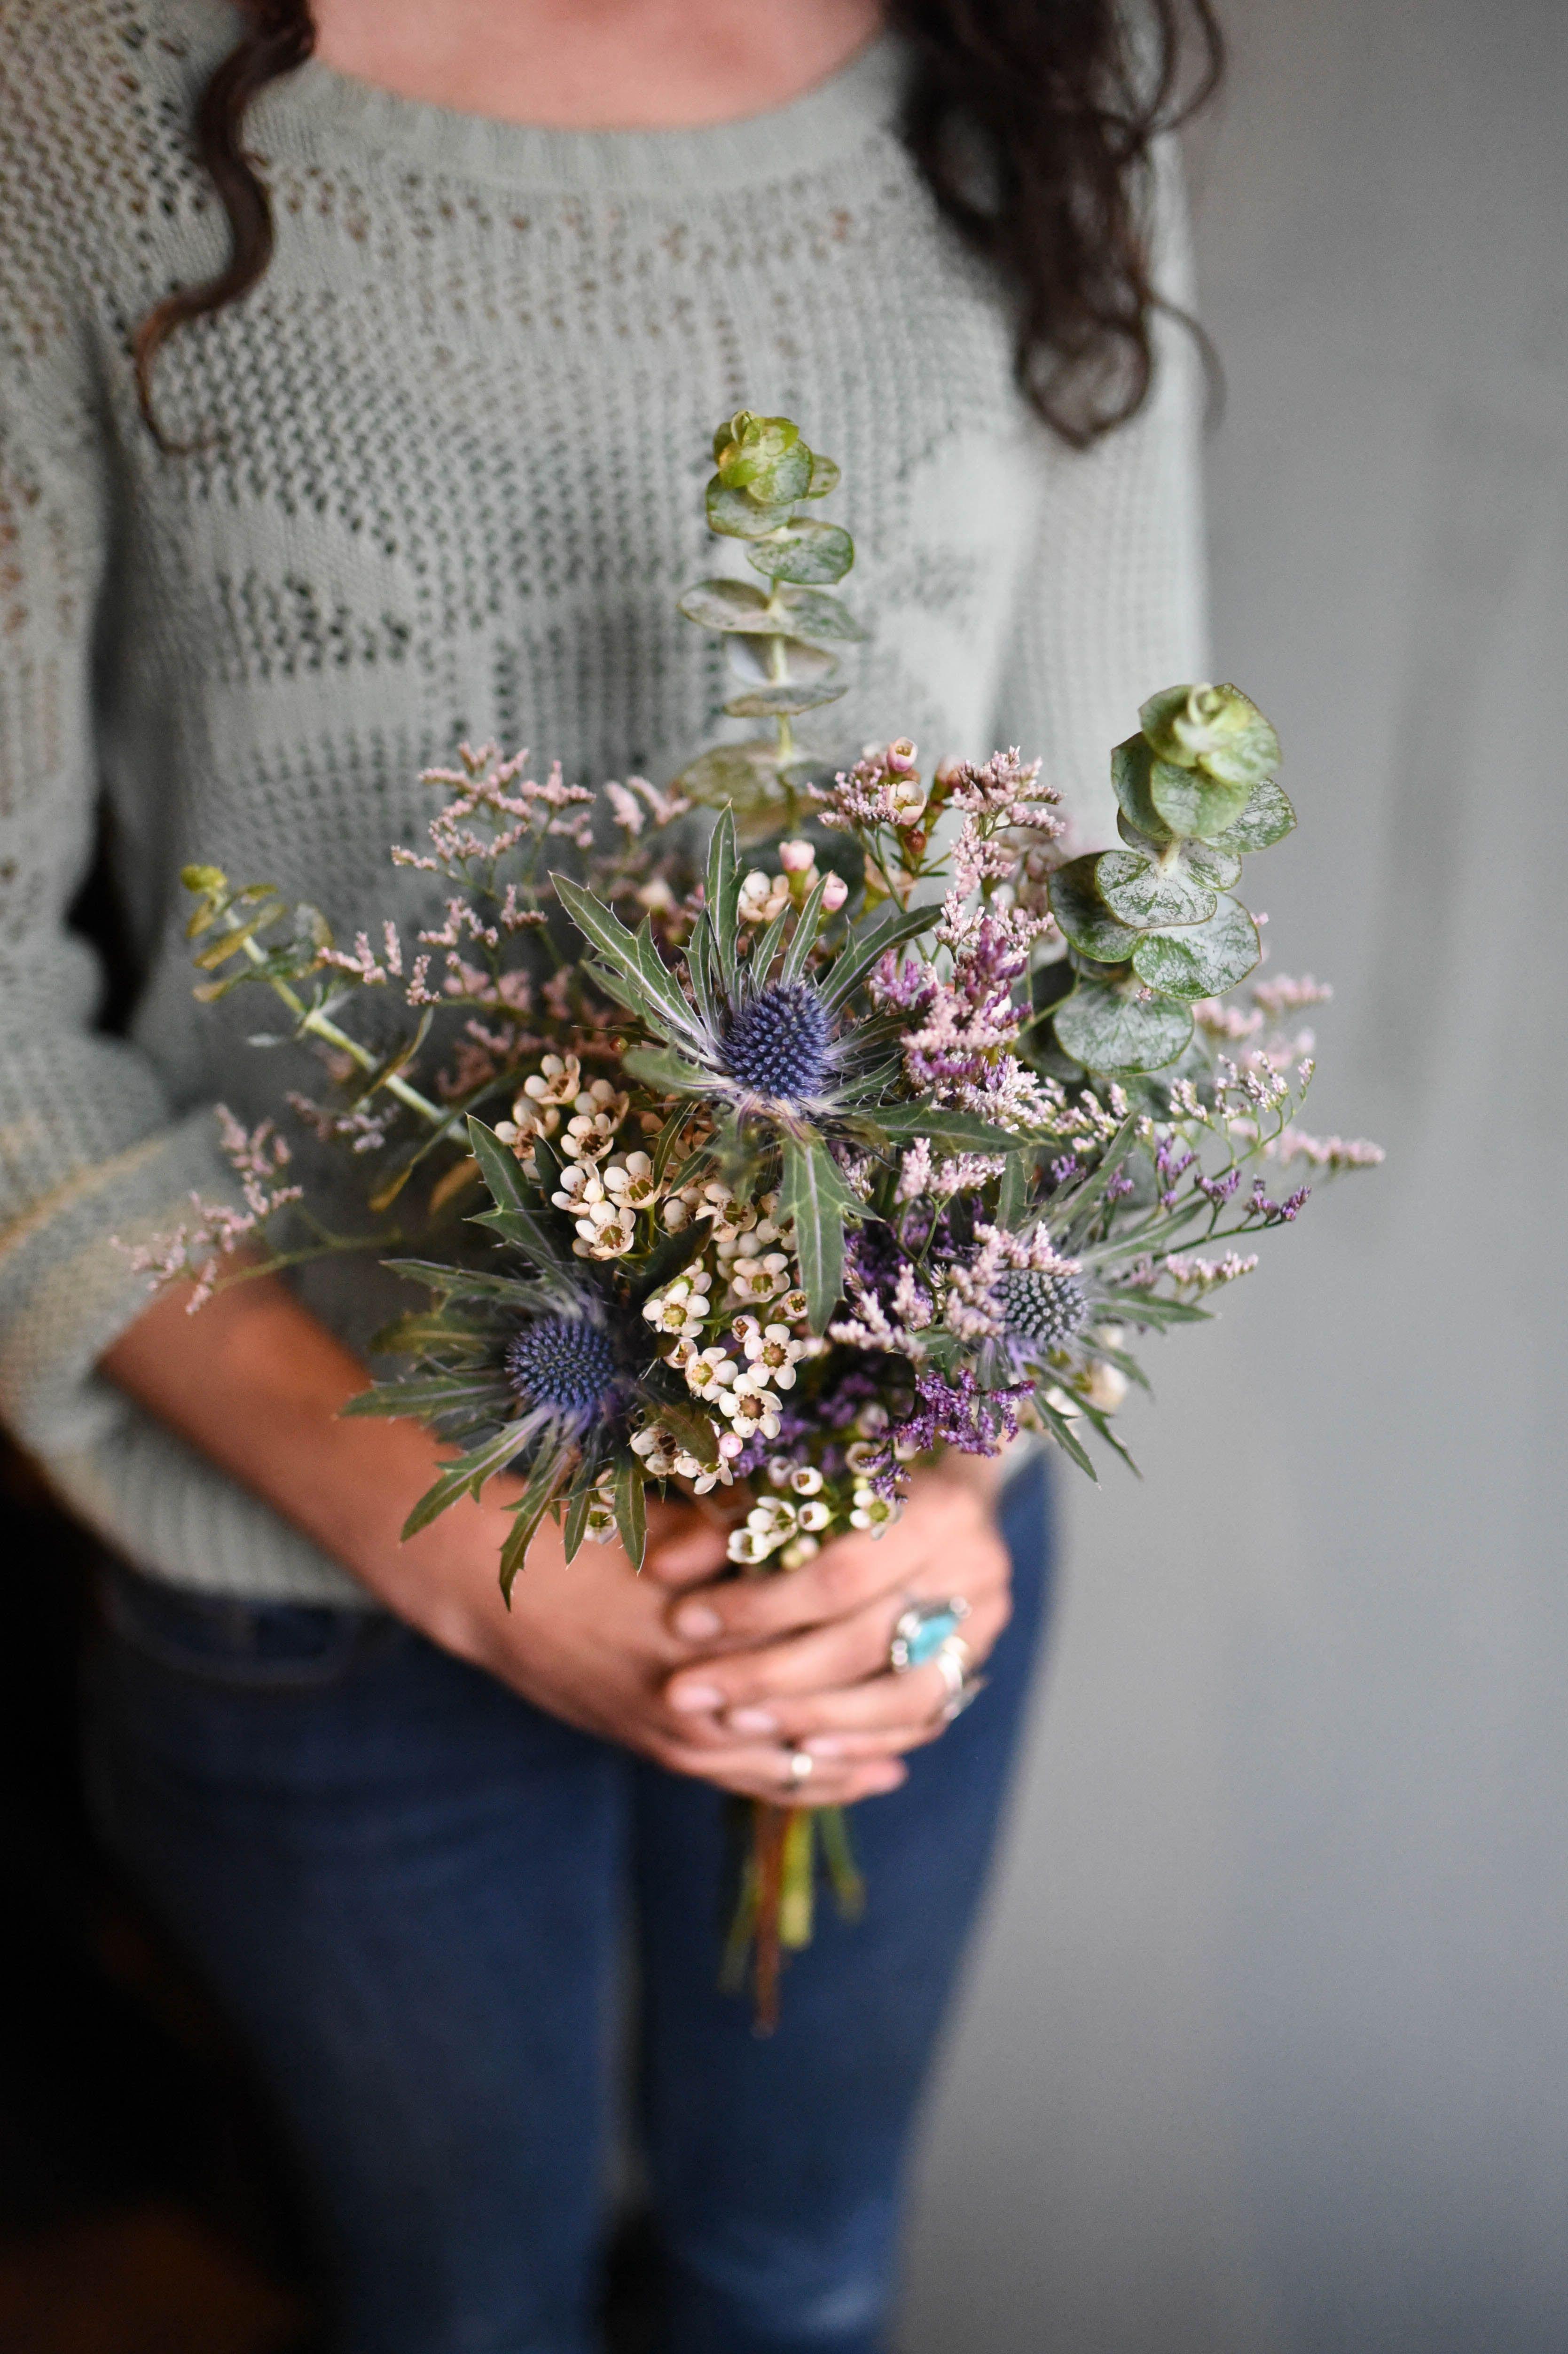 Seaside Wildflower Wedding Bouquet Featuring Statice Wax Flowers